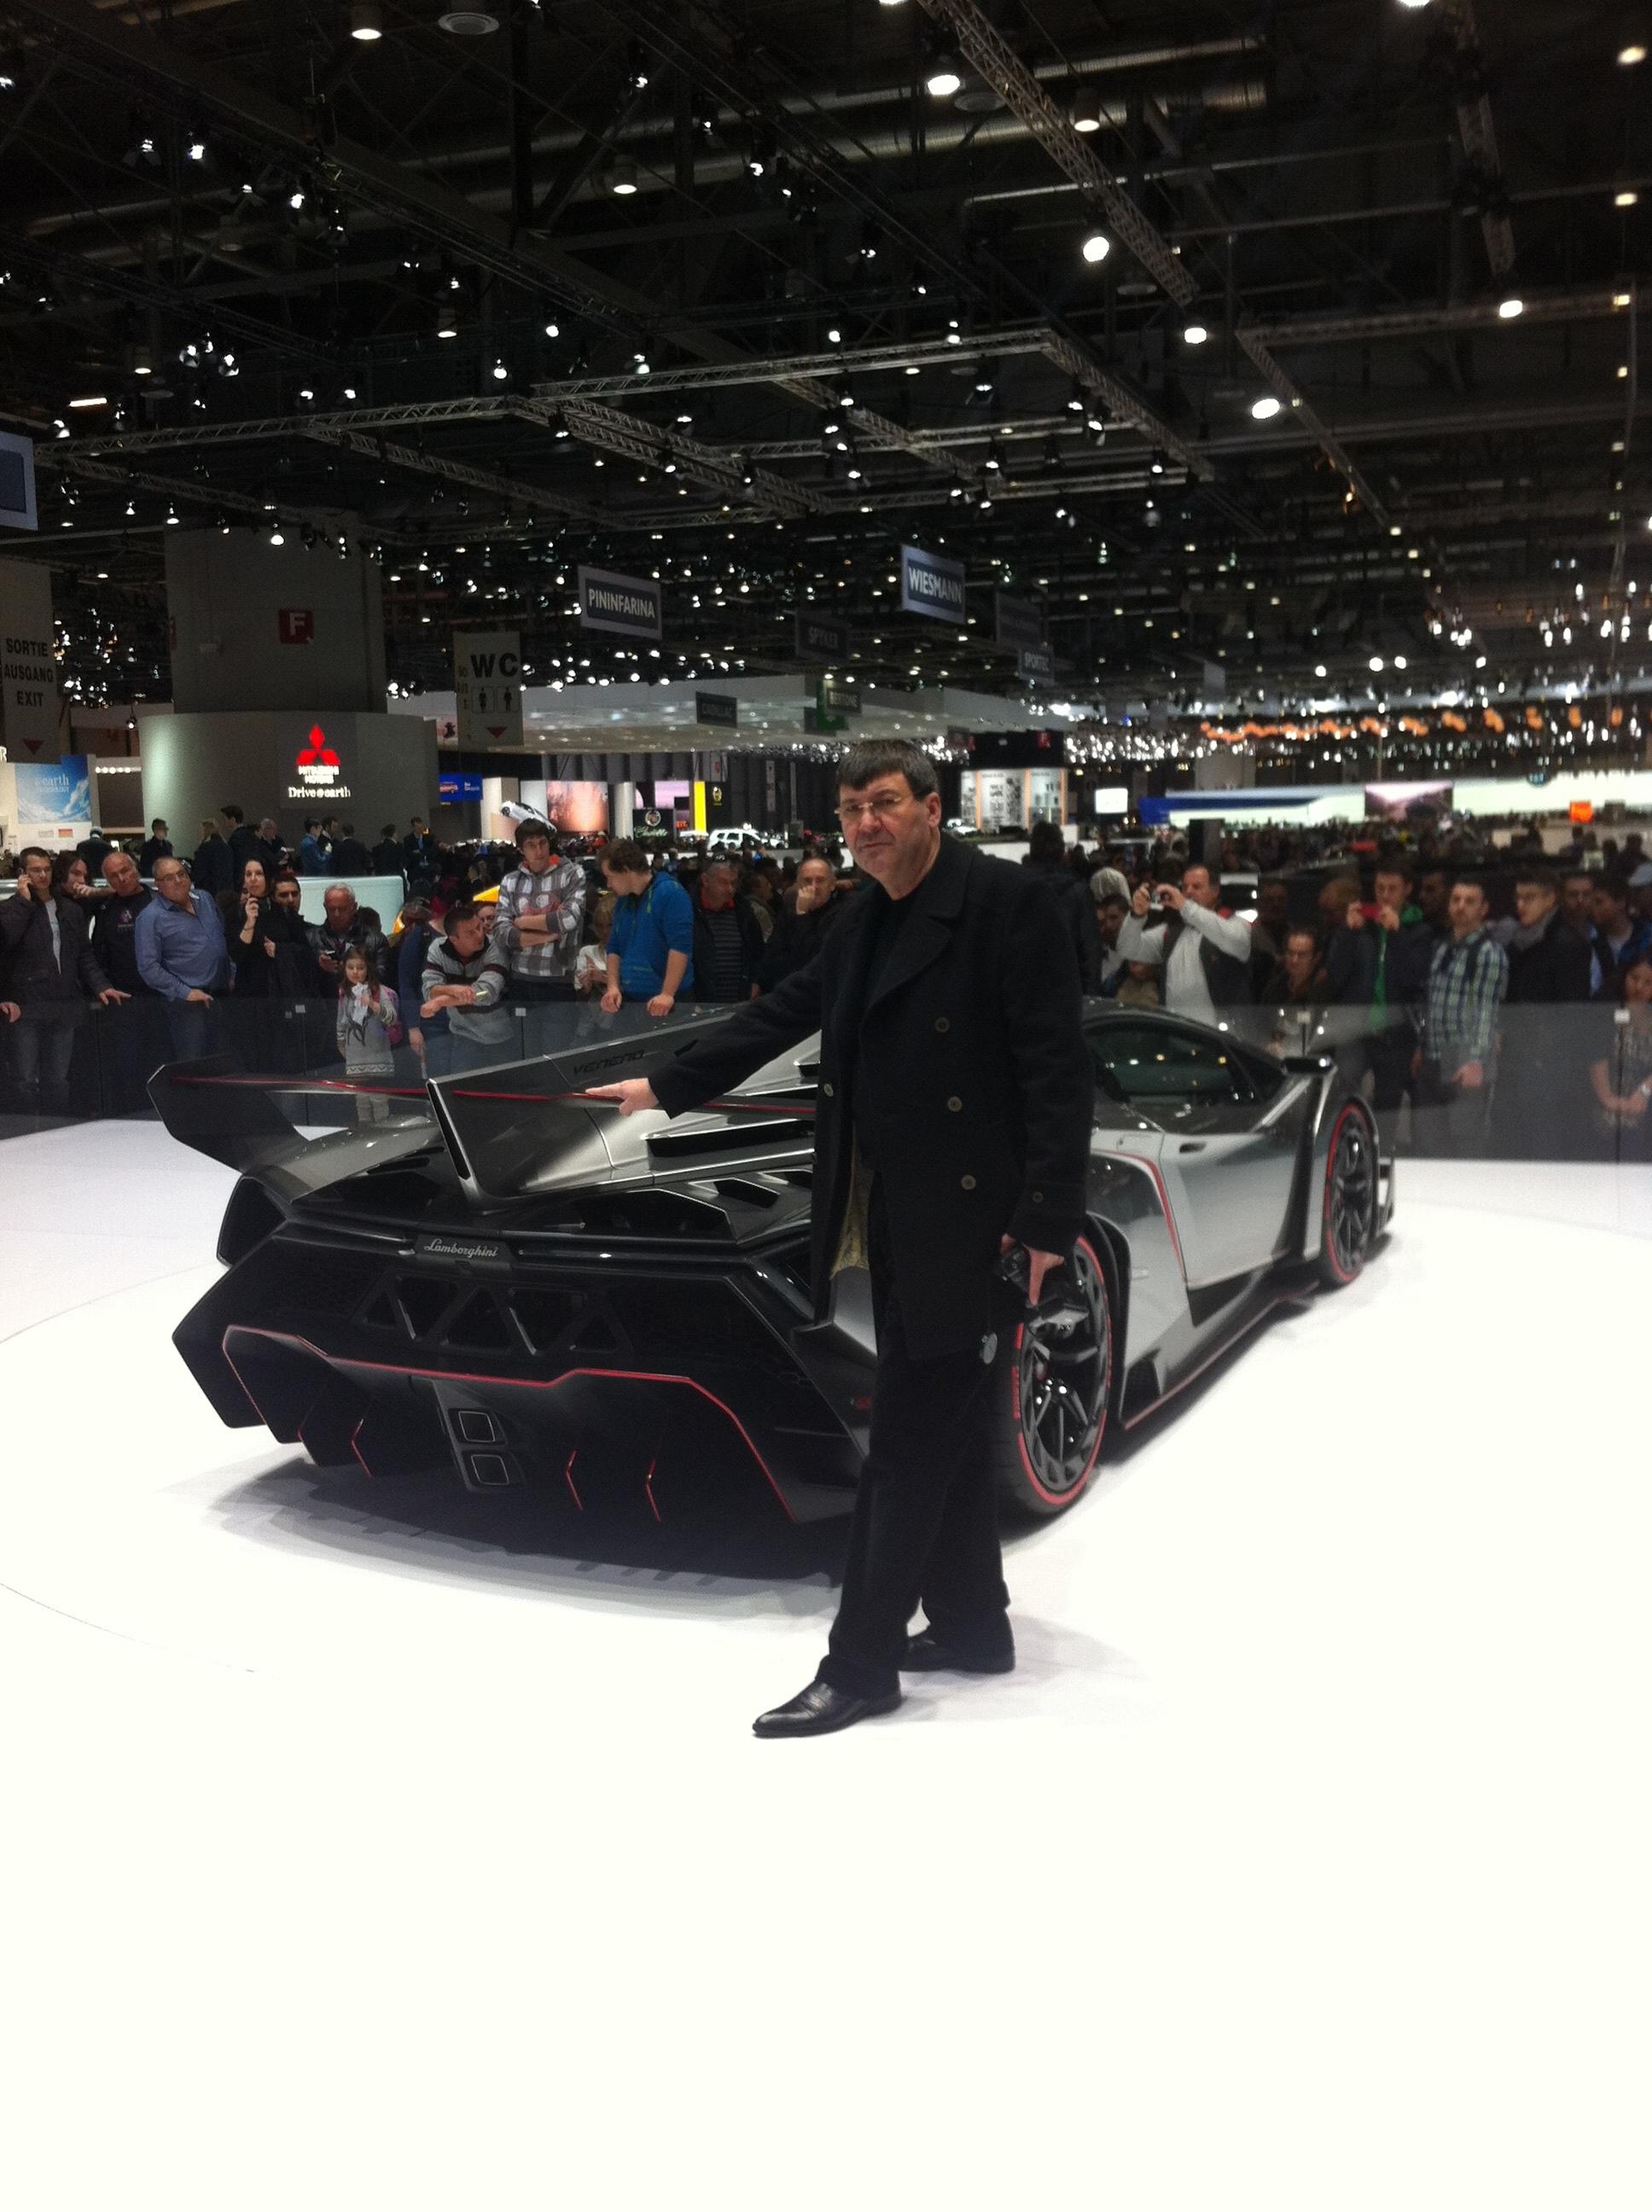 Cel mai nou model de Lamborghini, Veneno, va fi fabricat in numai trei exemplare